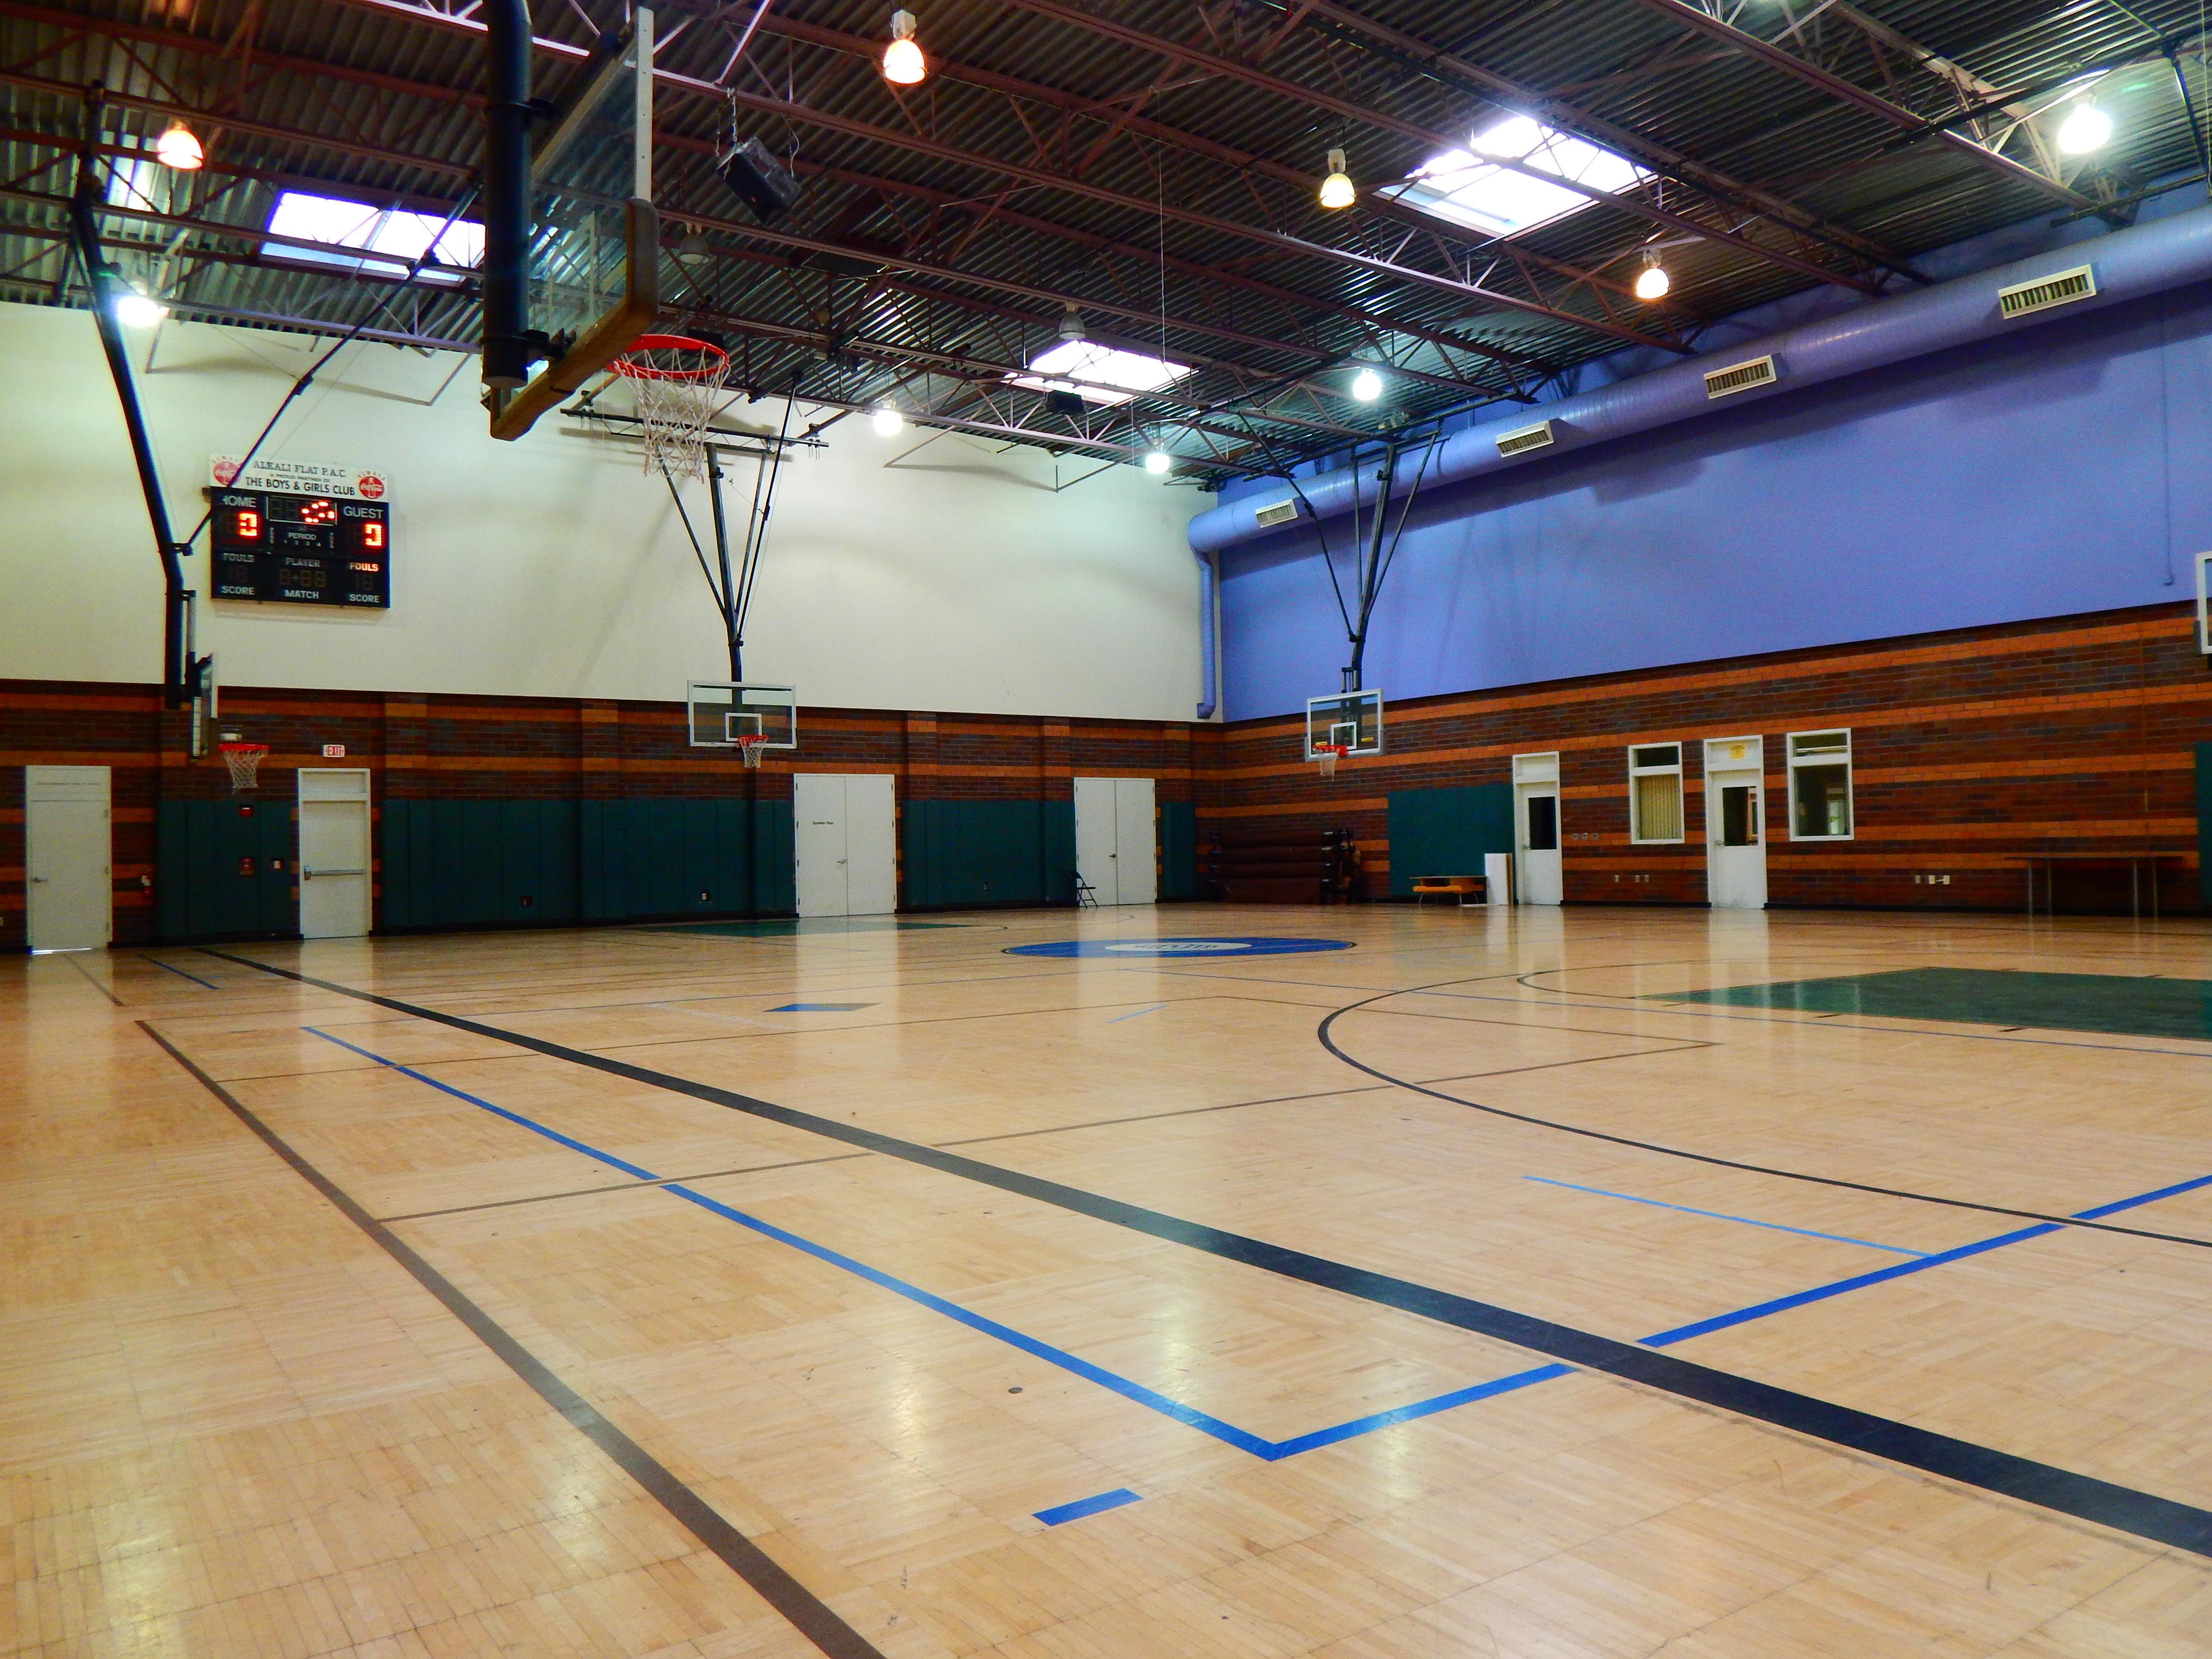 Raley Gymnasium